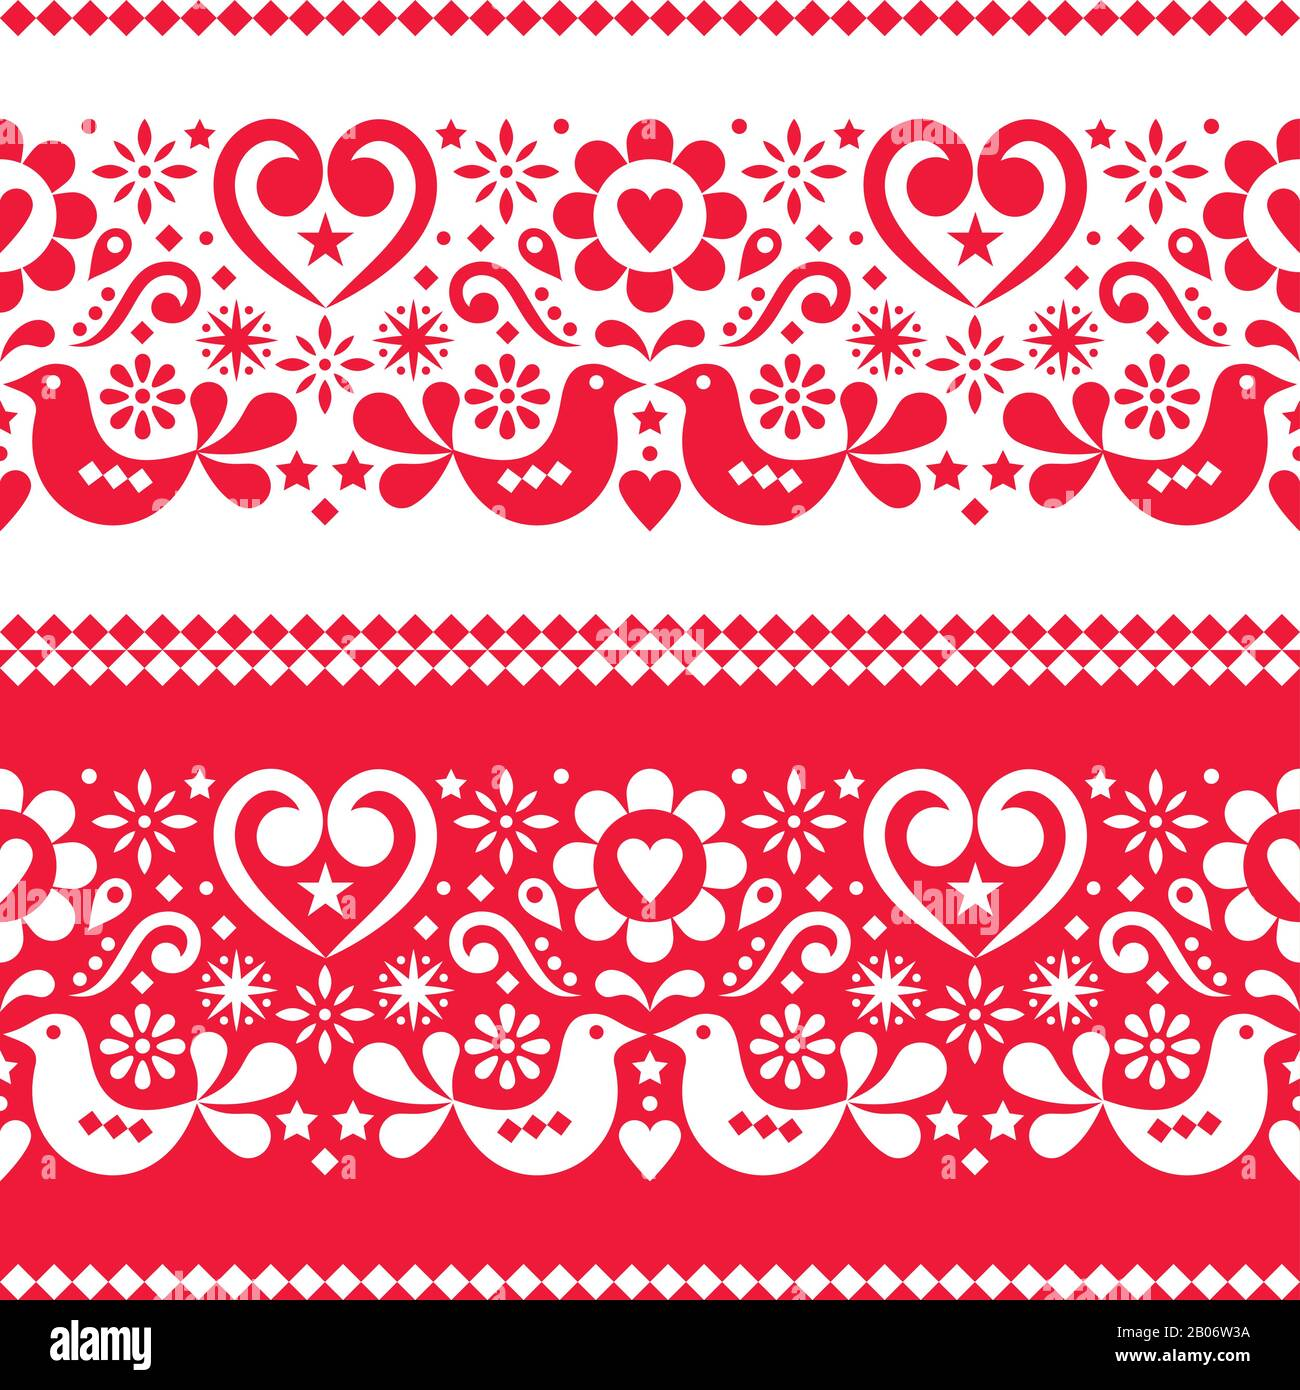 C Scandi Folk Art Posavasos Tarjetas Flores Corazón Pájaro Gráfico de punto de cruz